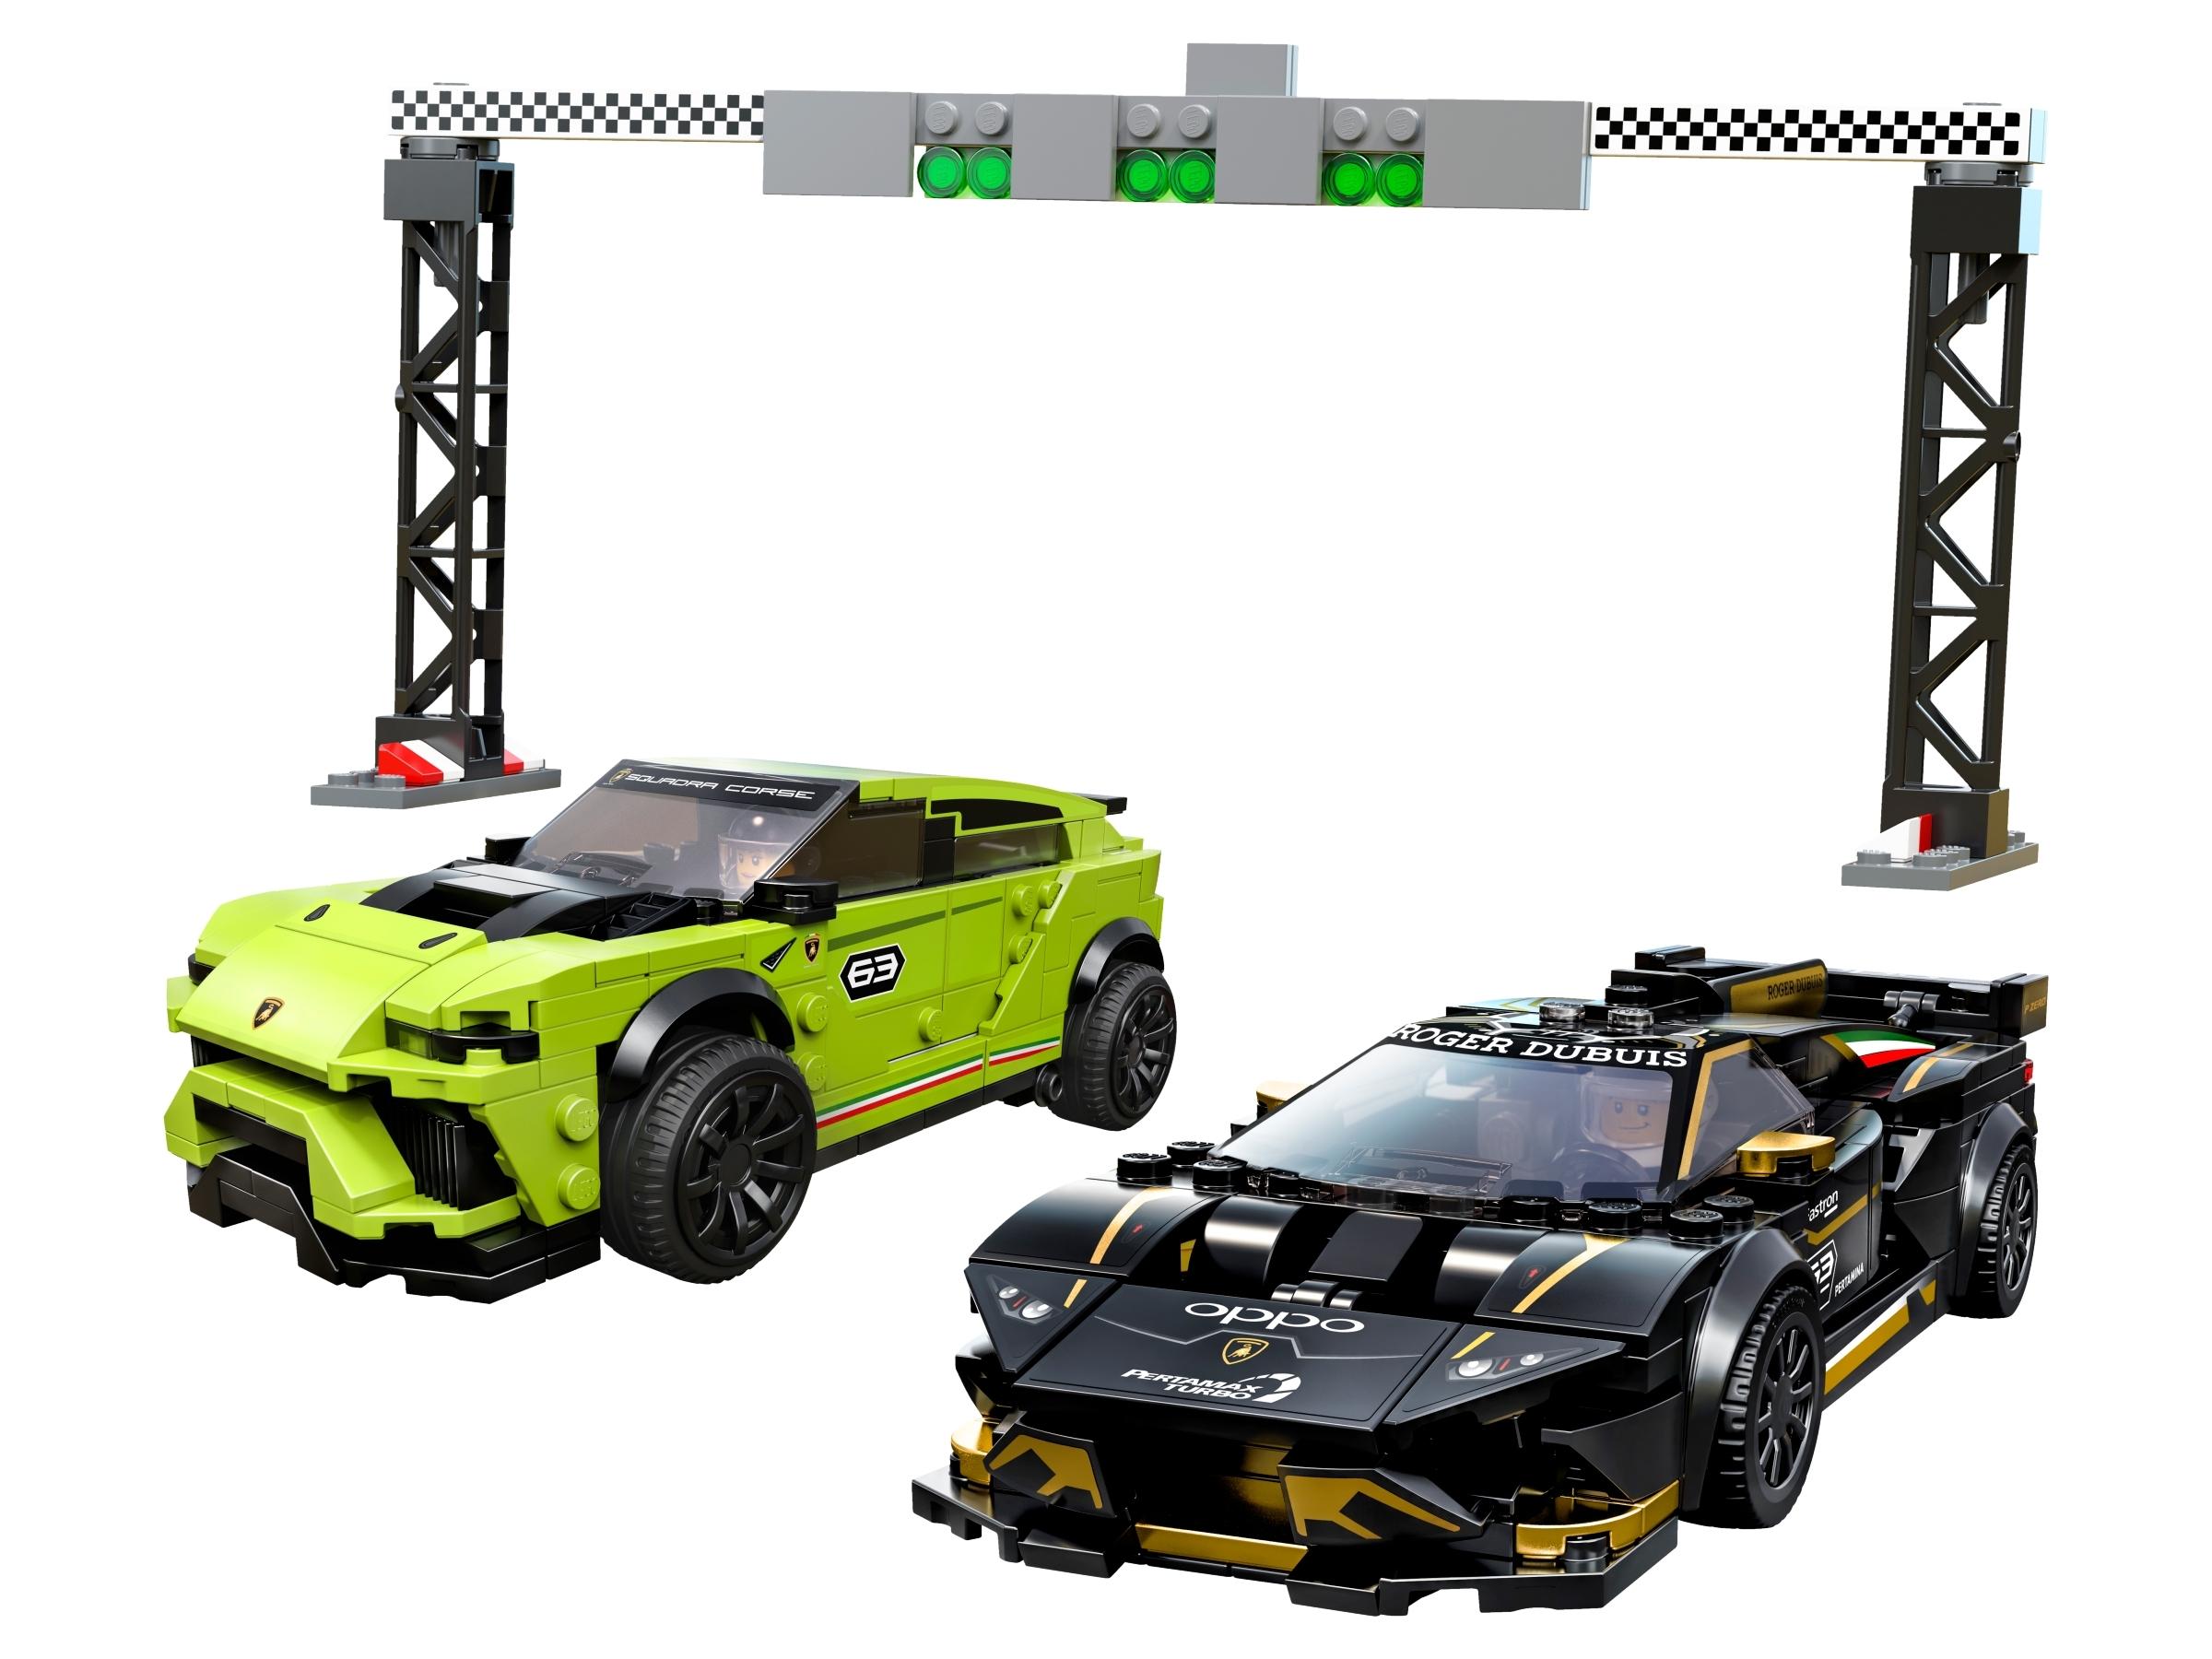 Lamborghini Urus St X Lamborghini Huracan Super Trofeo Evo 76899 Speed Champions Buy Online At The Official Lego Shop Us